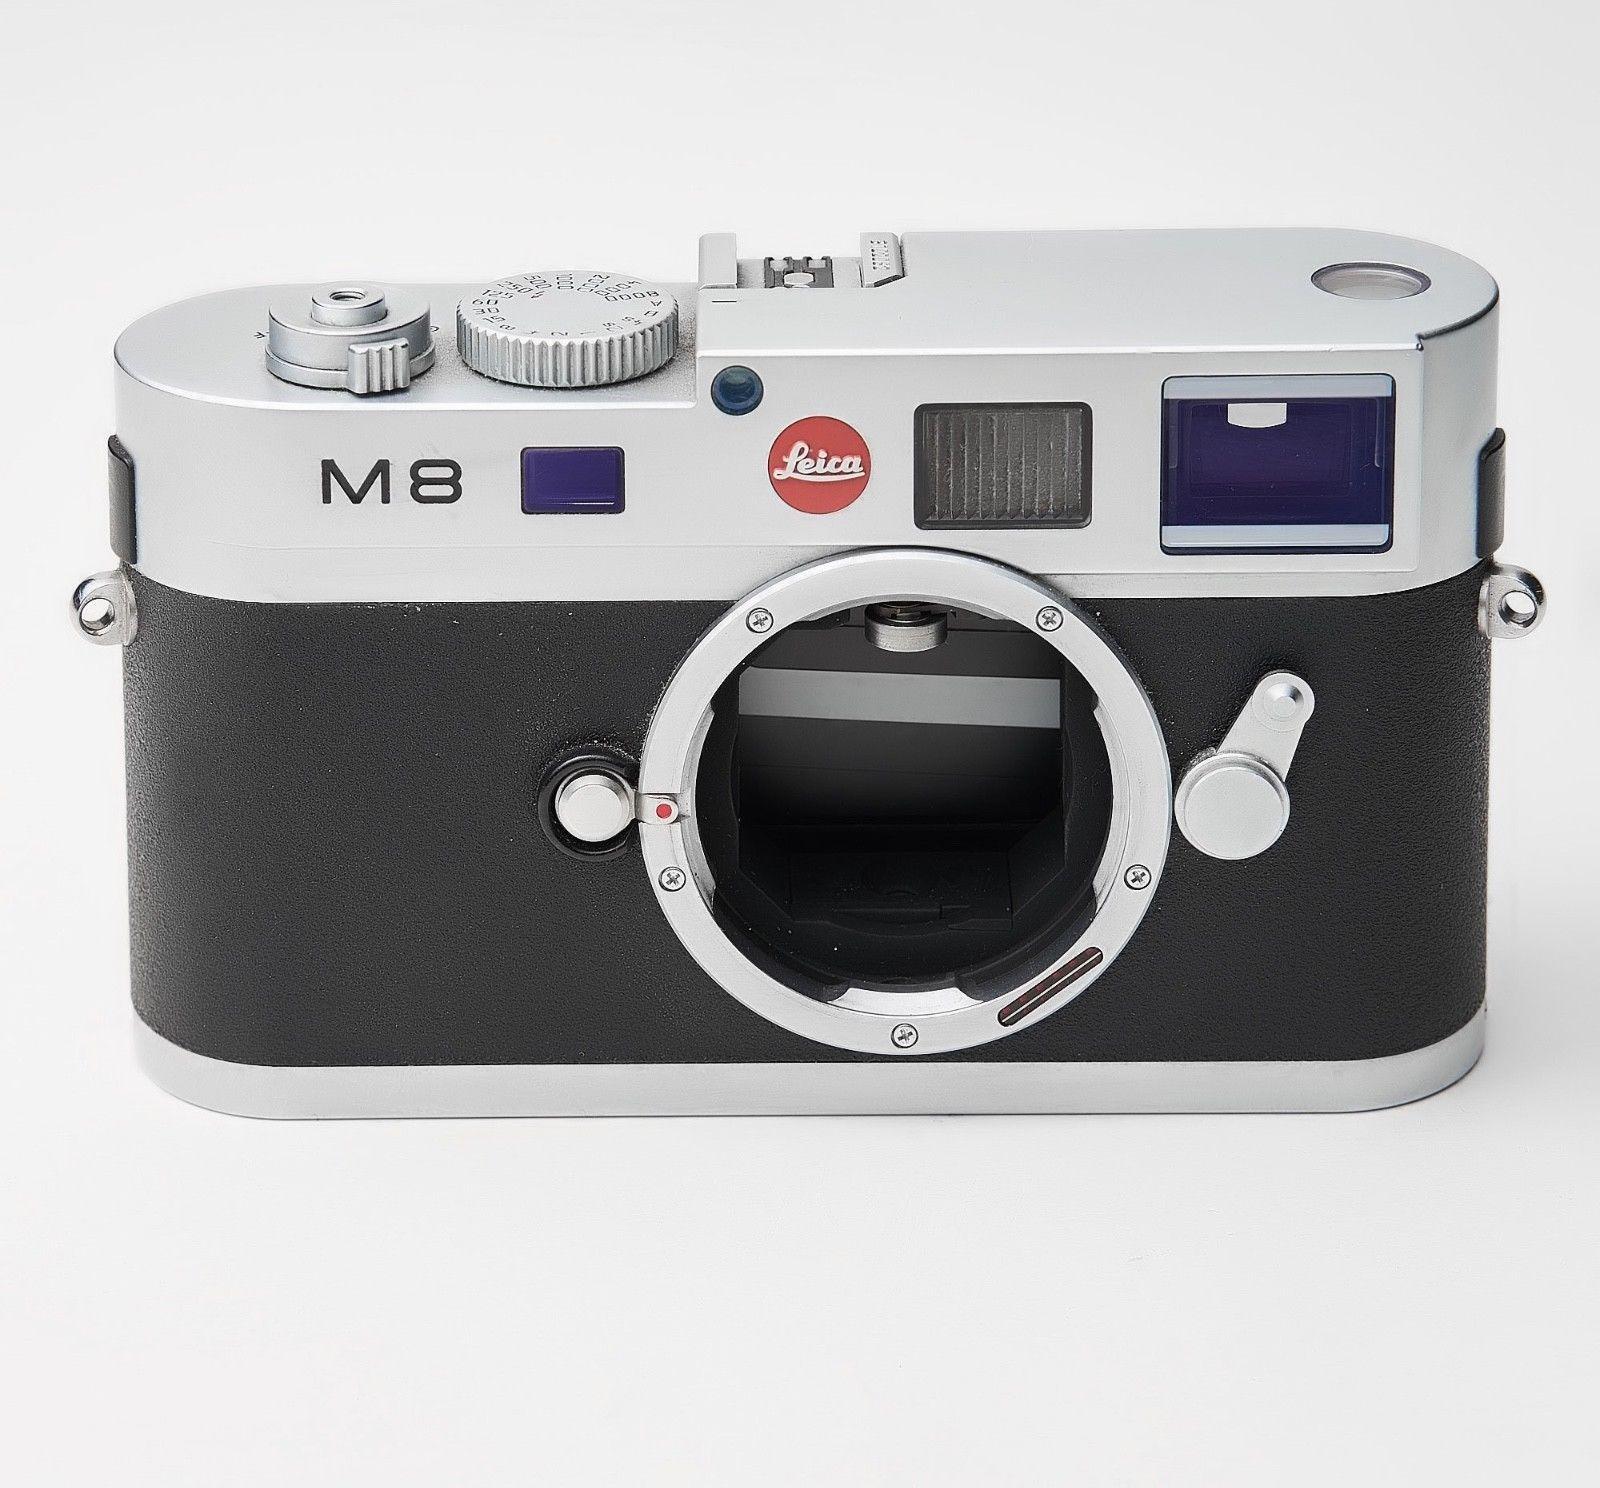 Leica M M8 10.3MP Digitalkamera - chrom